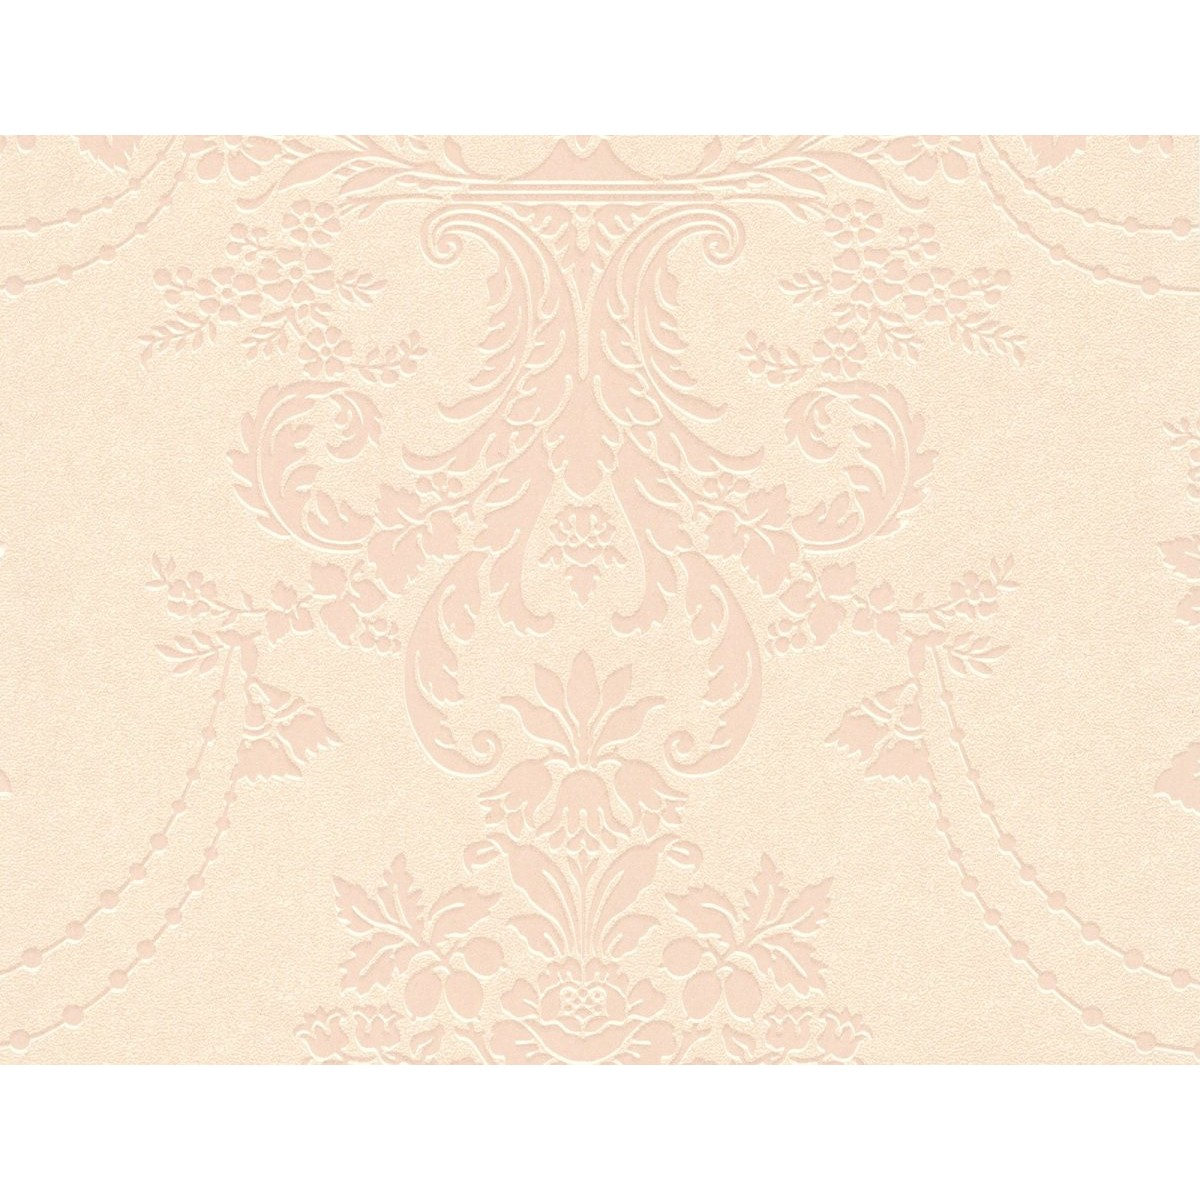 Обои флизелиновые Decor Deluxe International Vivaldi розовые 0.53 м R03406/2